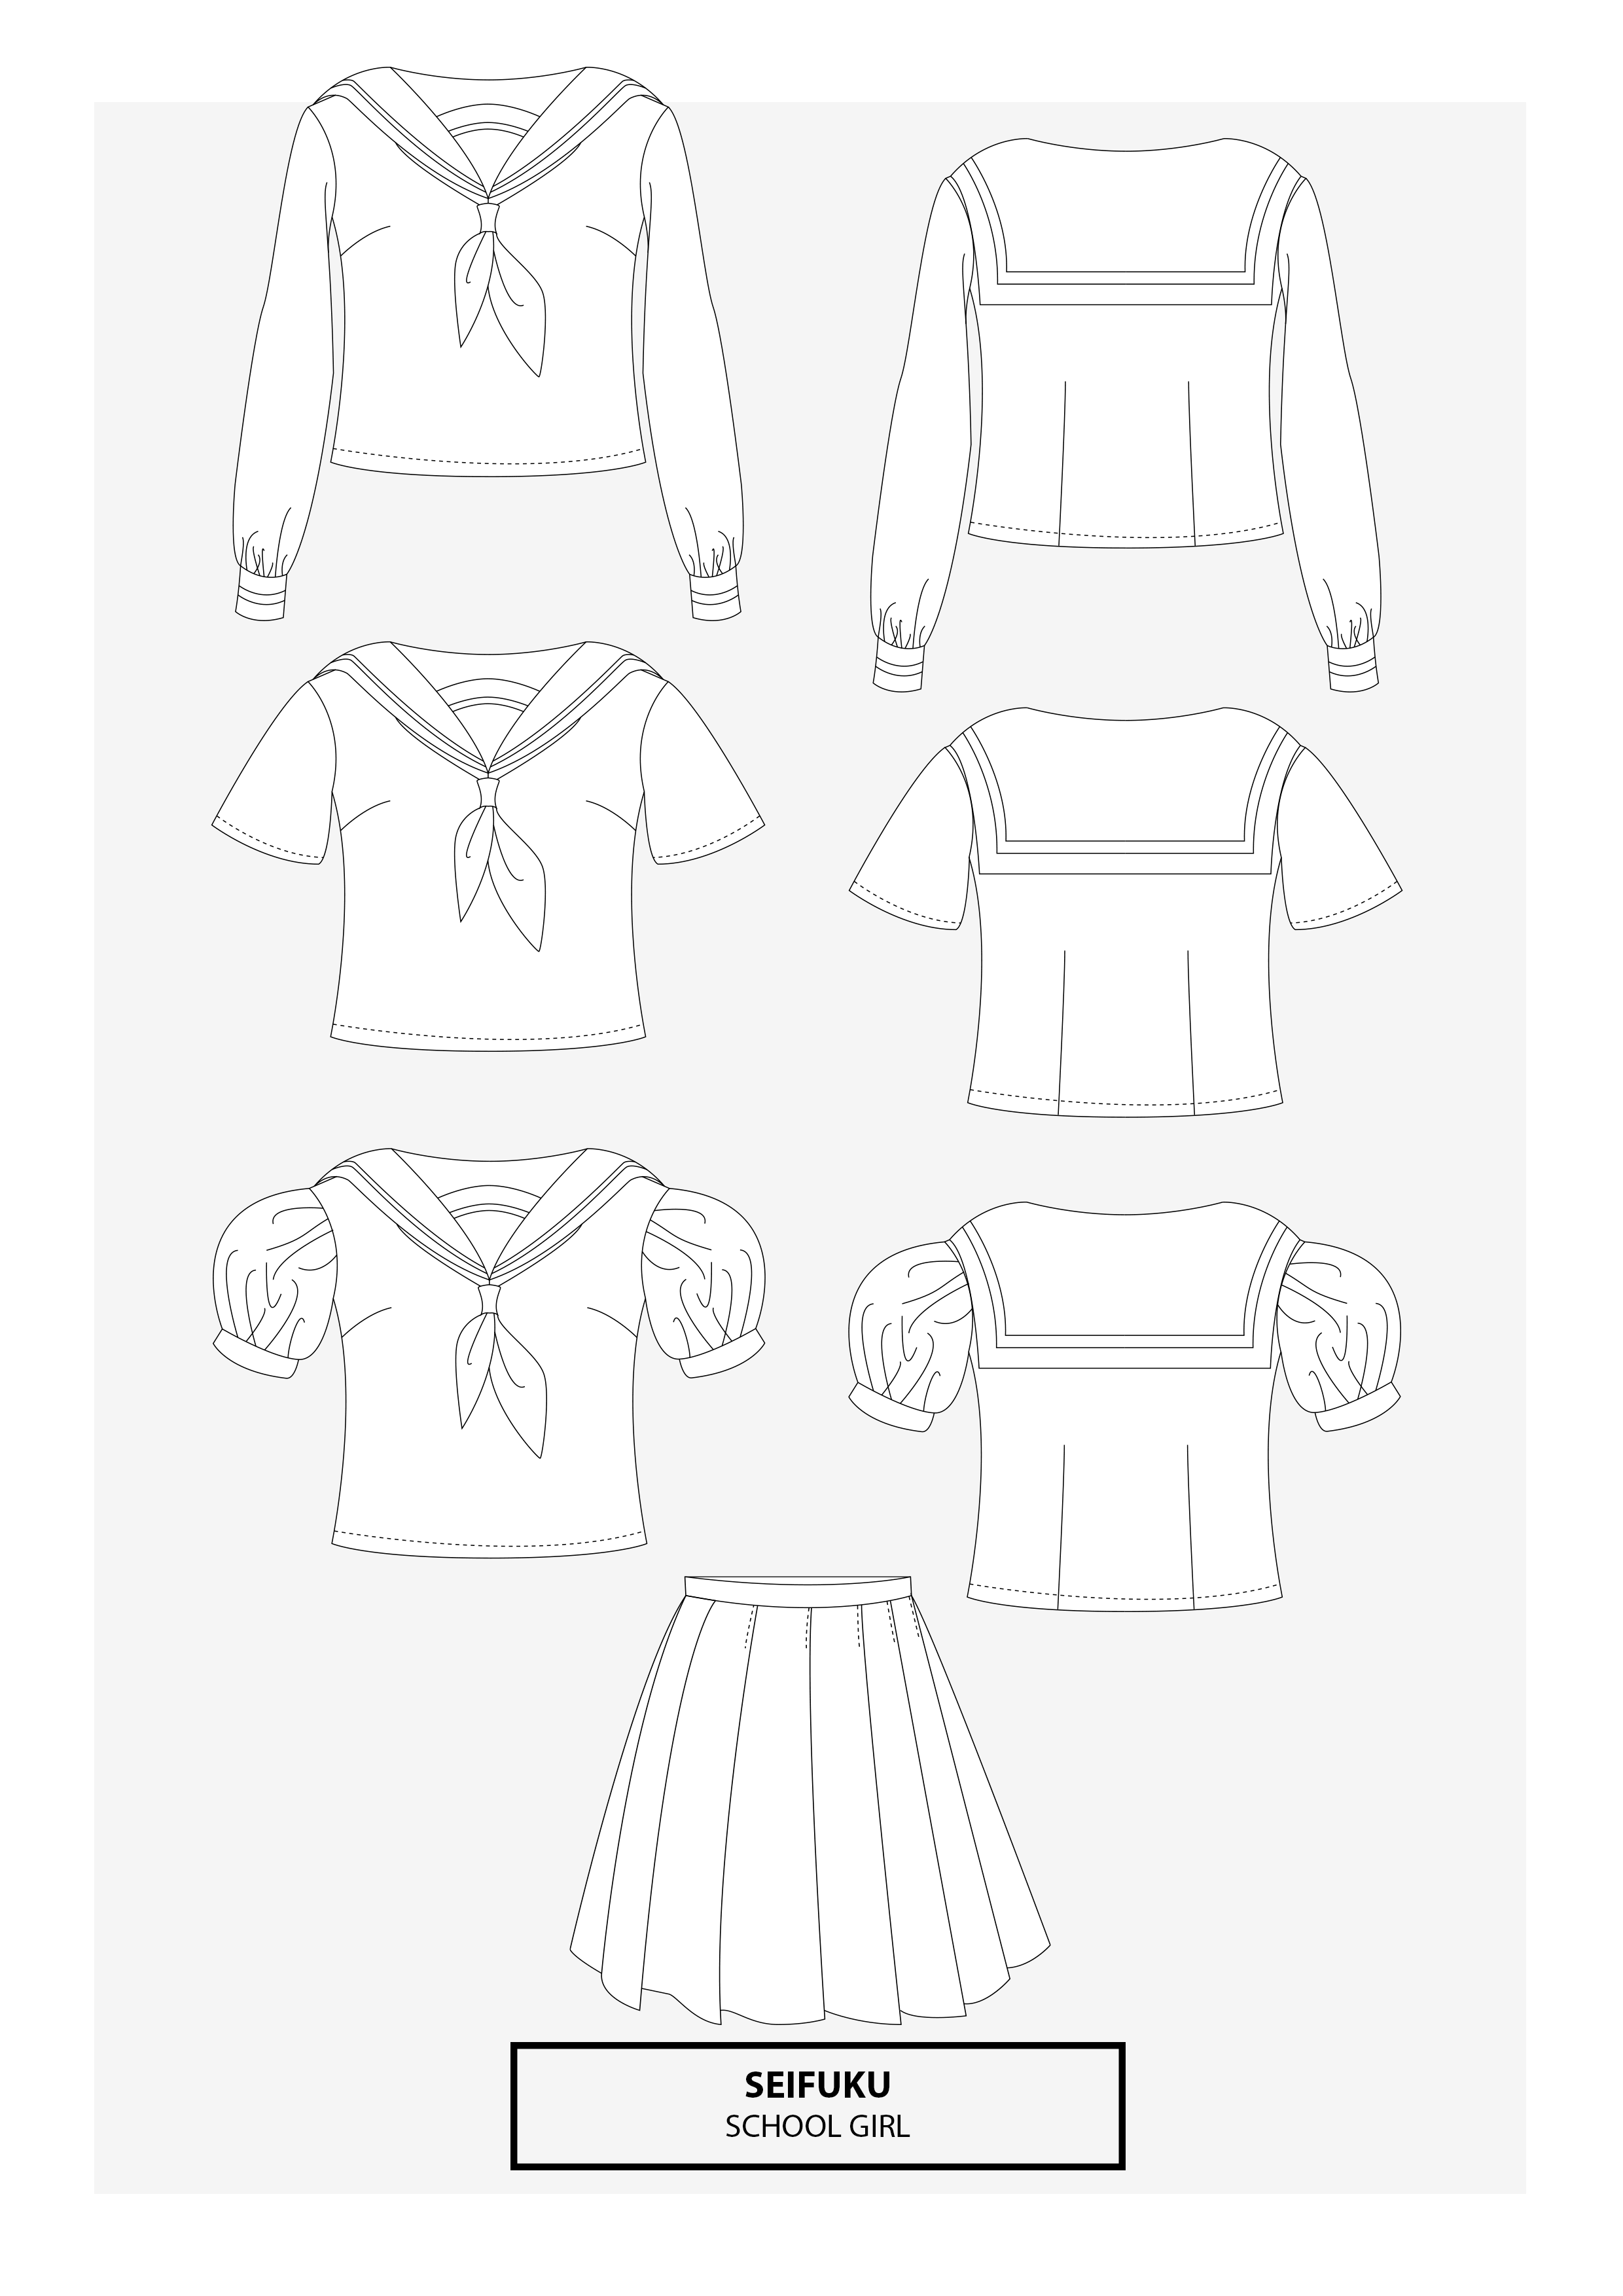 Seifuku Japanese School Uniform | Cosplay Sewing Pattern | Cosplay ...